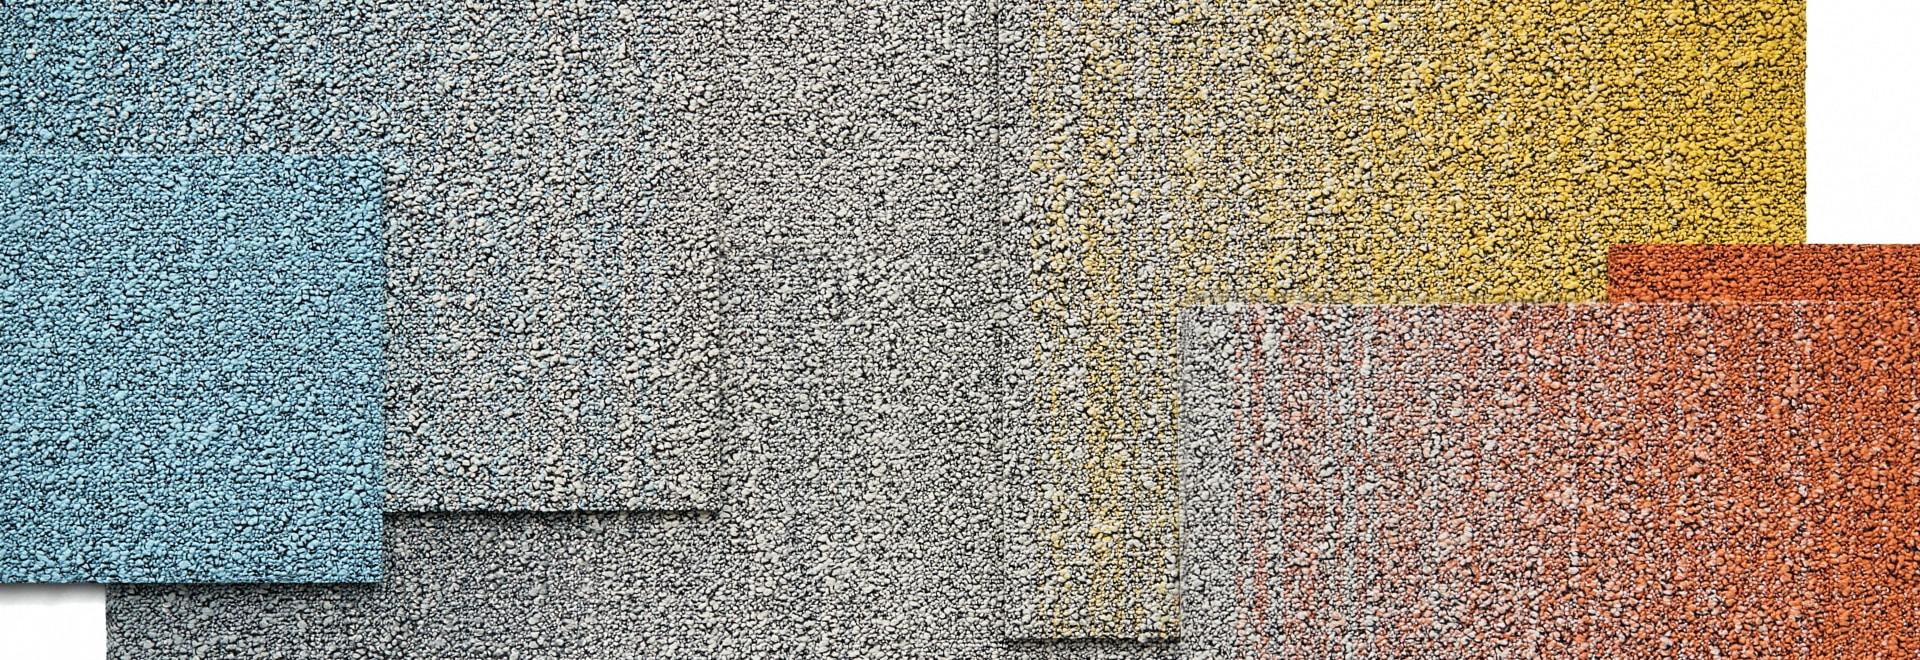 Desso Fuse Carpet Tiles Big Box Office Interiors Design